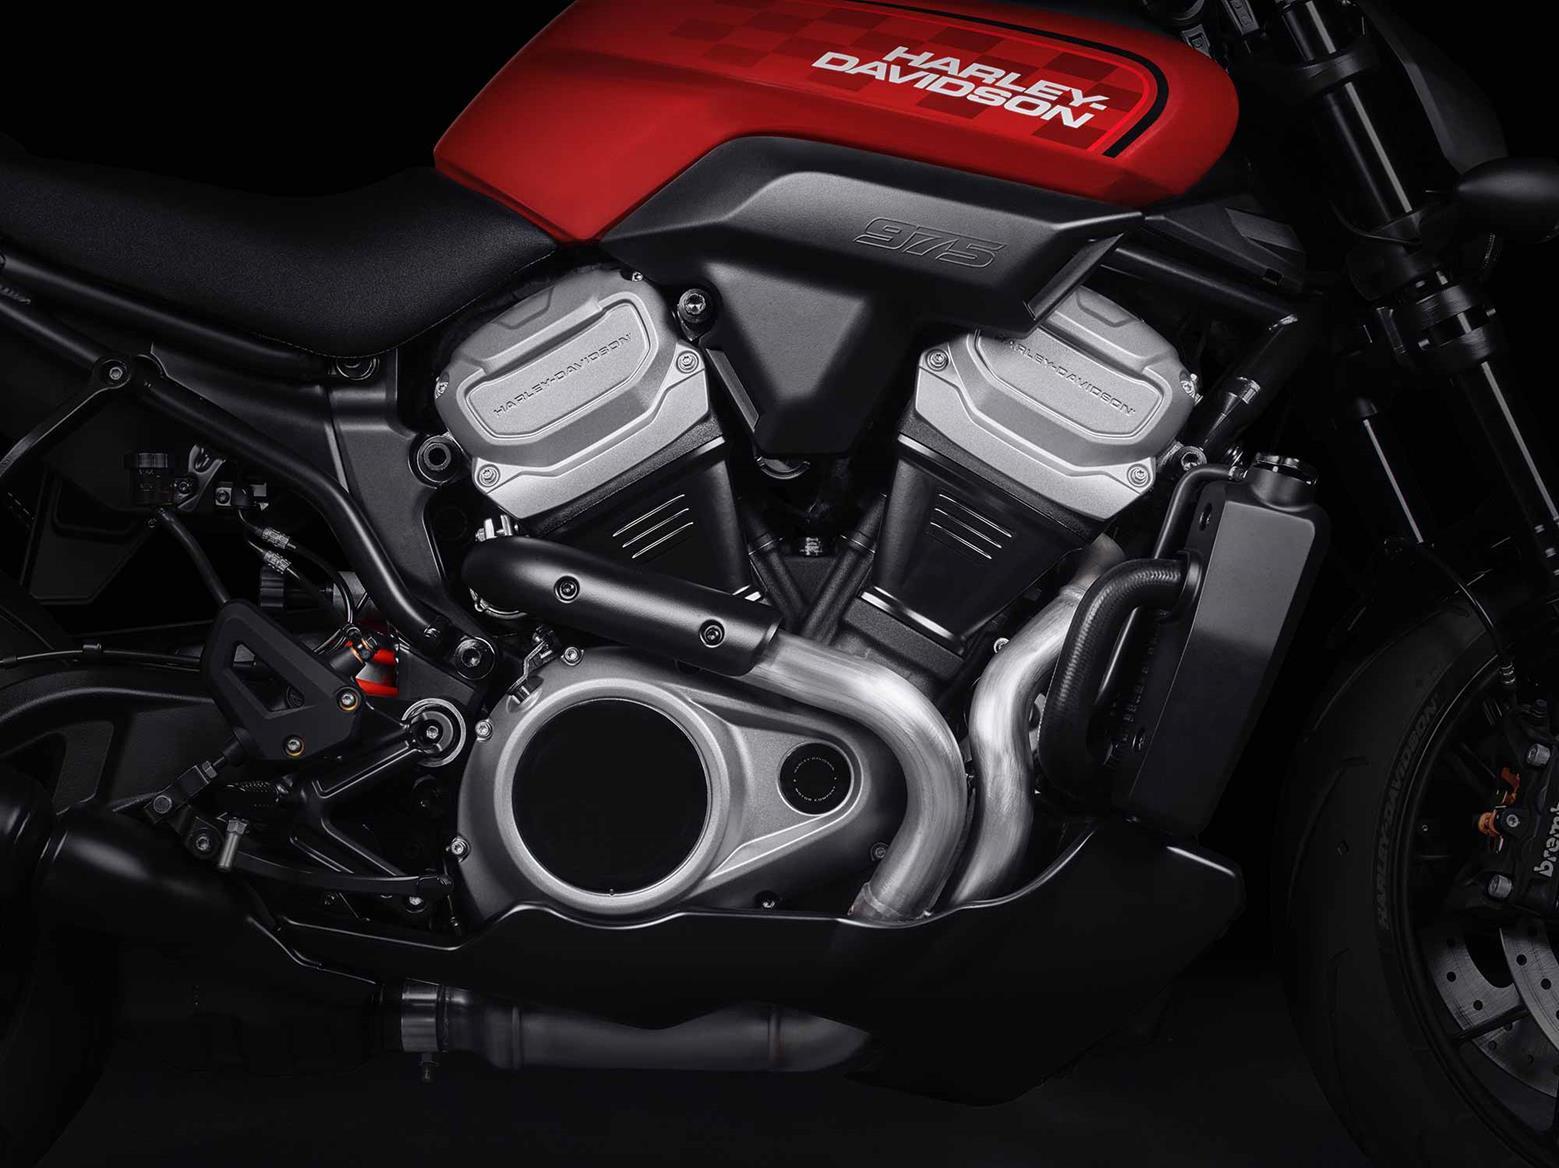 Harley-Davidson 'Bronx' V-Twin engine